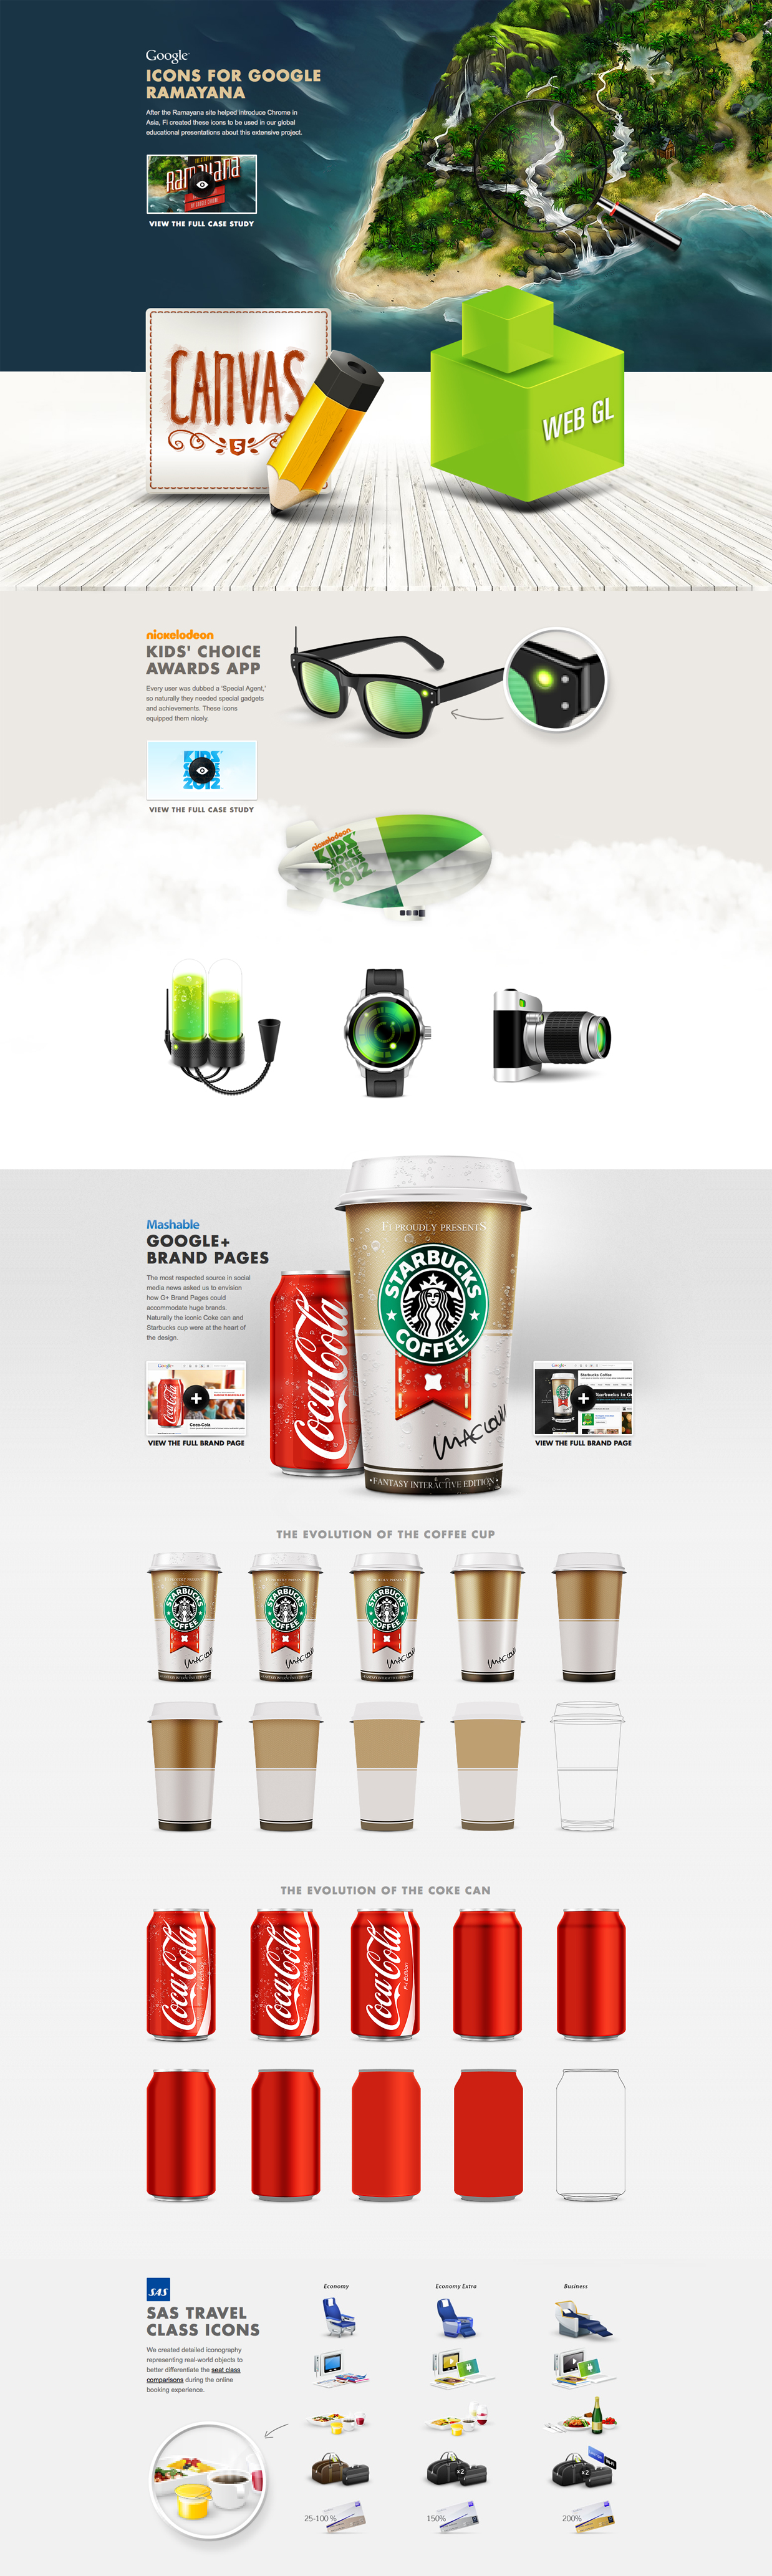 Iconography by Fi | #icon #iconography #webdesign #Fi #case